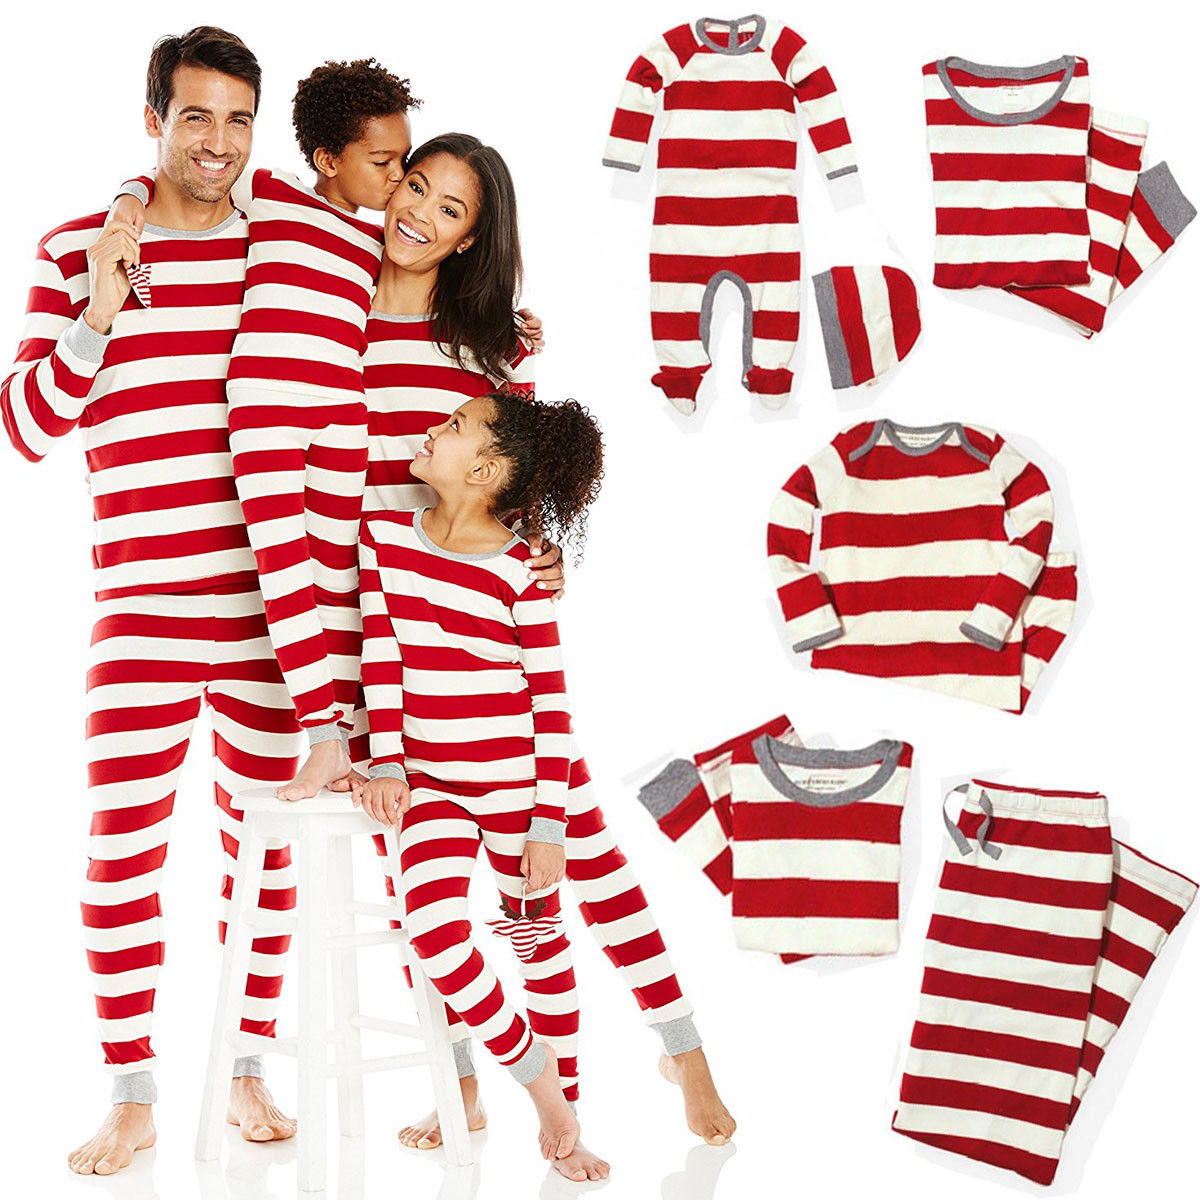 Xmas Striped Family Matching Outfits Set Christmas Family Pajamas Set Adult Kid Sleepwear Nightwear Pjs Photgraphy Prop Clothing